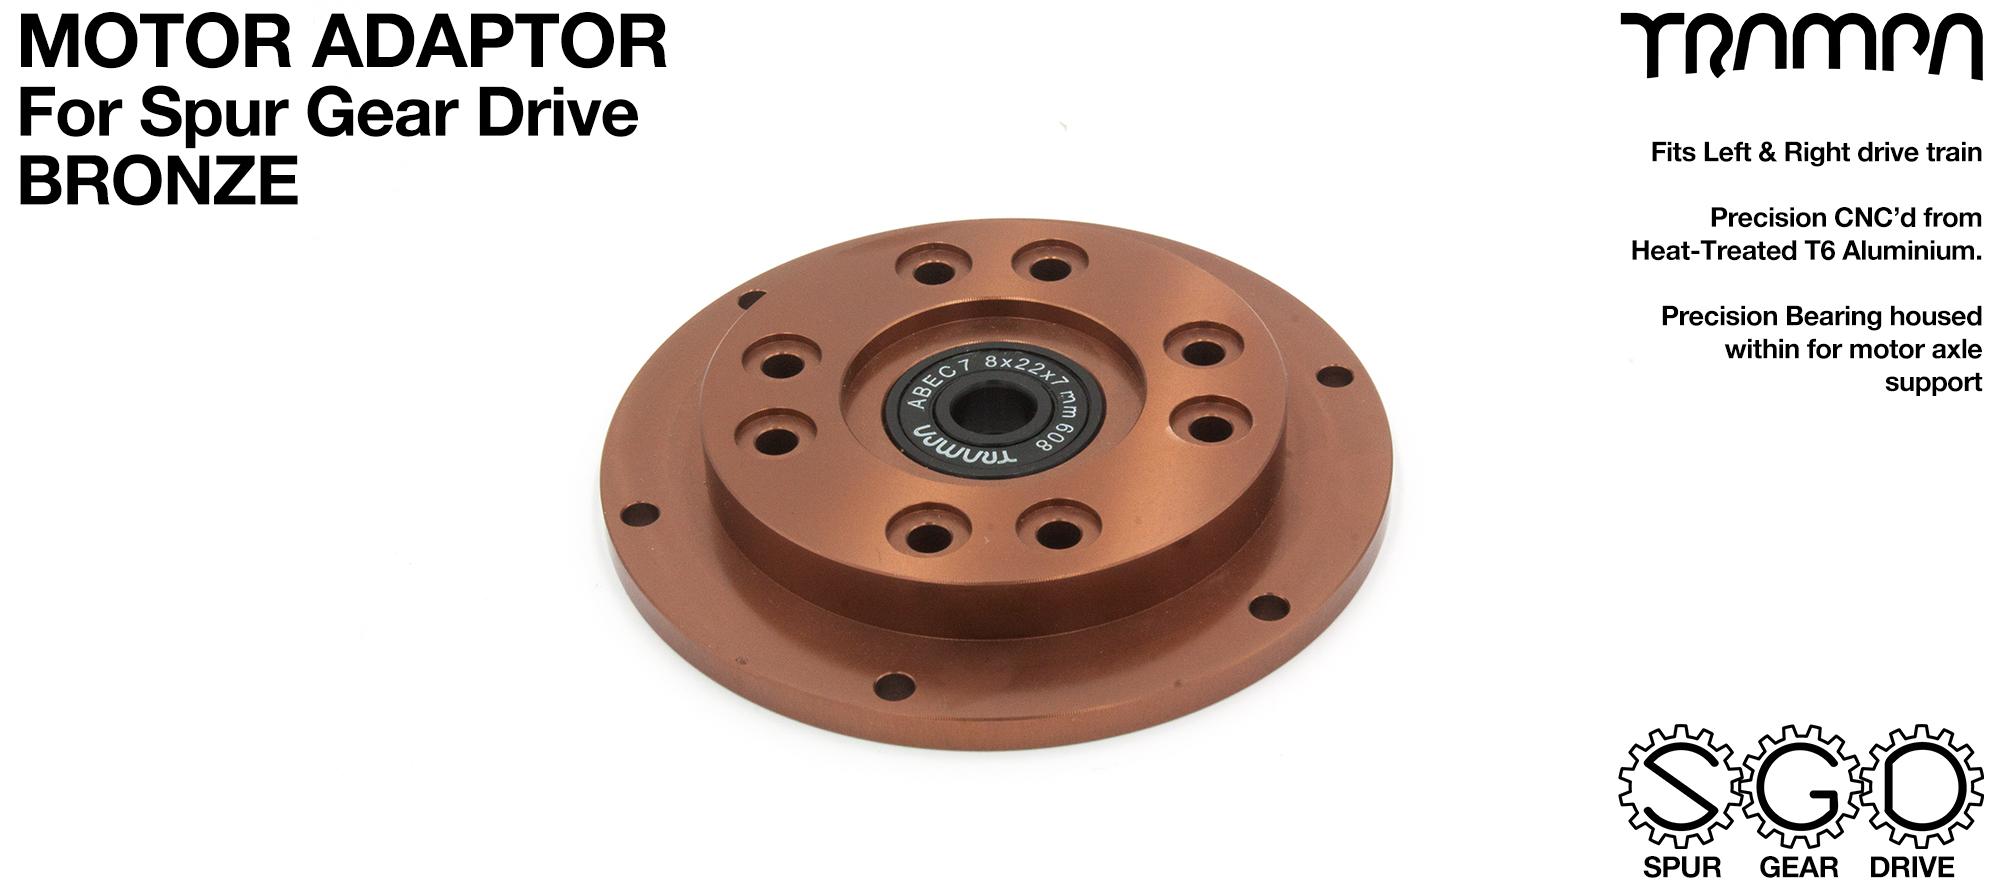 SPUR Gear Drive Motor Adaptor BRONZE